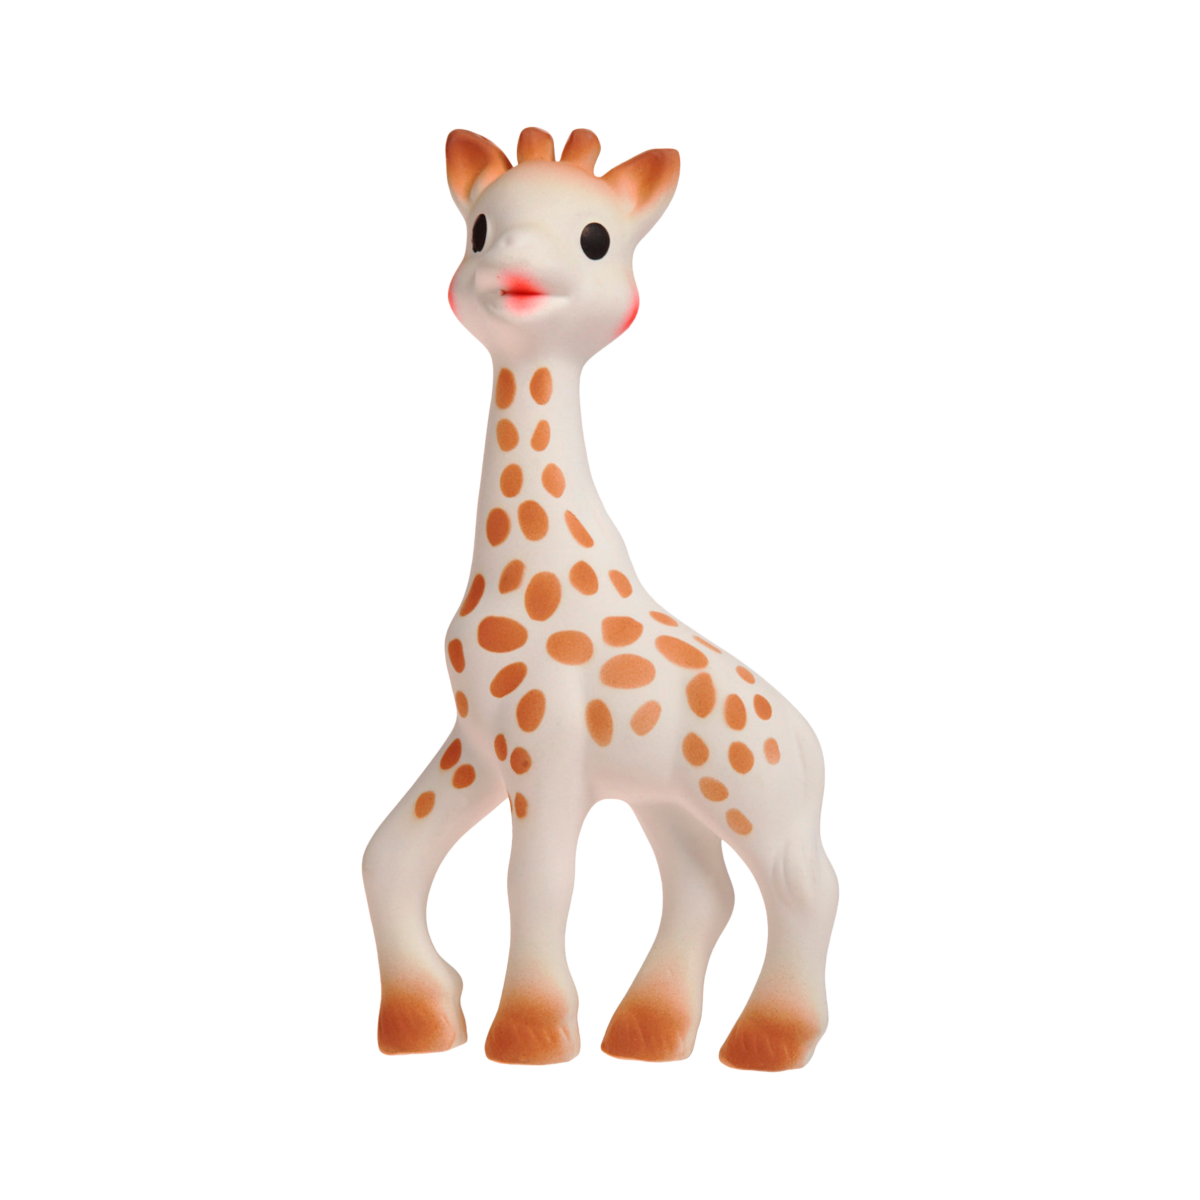 Anneau de dentition Sophie la girafe Vulli - 22,95 €